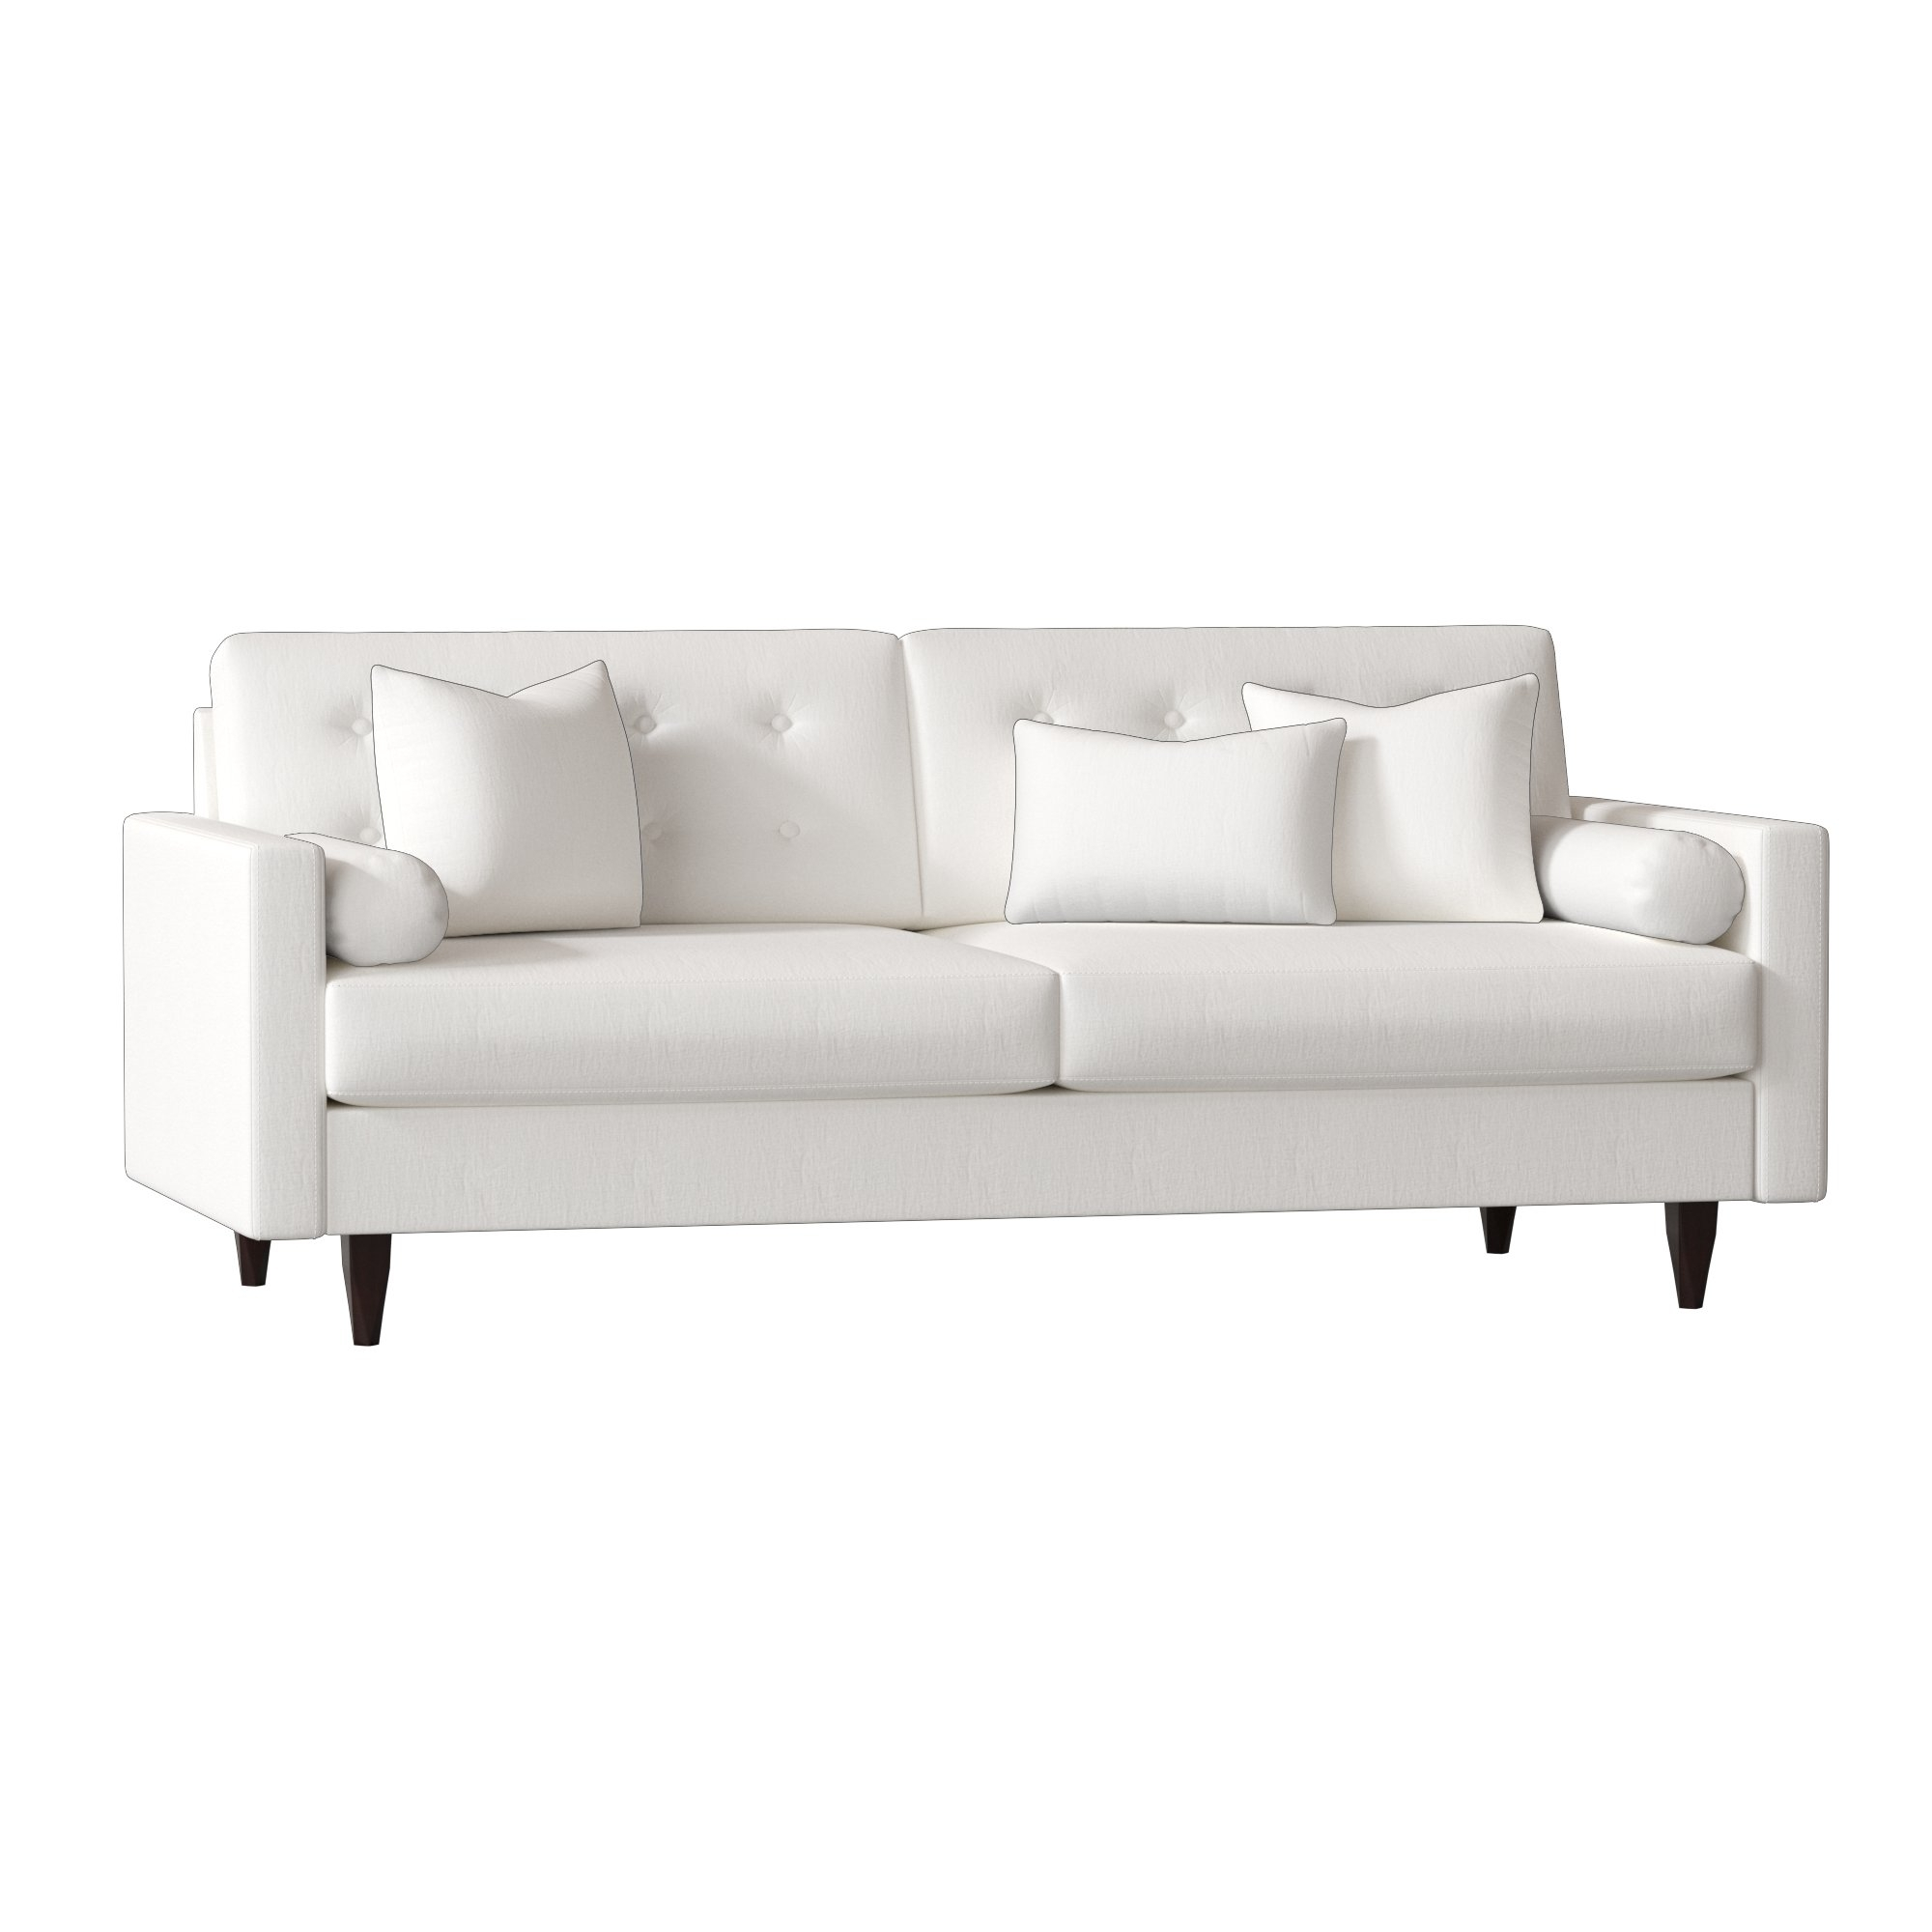 Wayfair Custom Upholstery™ Harper Sofa & Reviews | Wayfair In Harper Down 3 Piece Sectionals (Image 24 of 25)